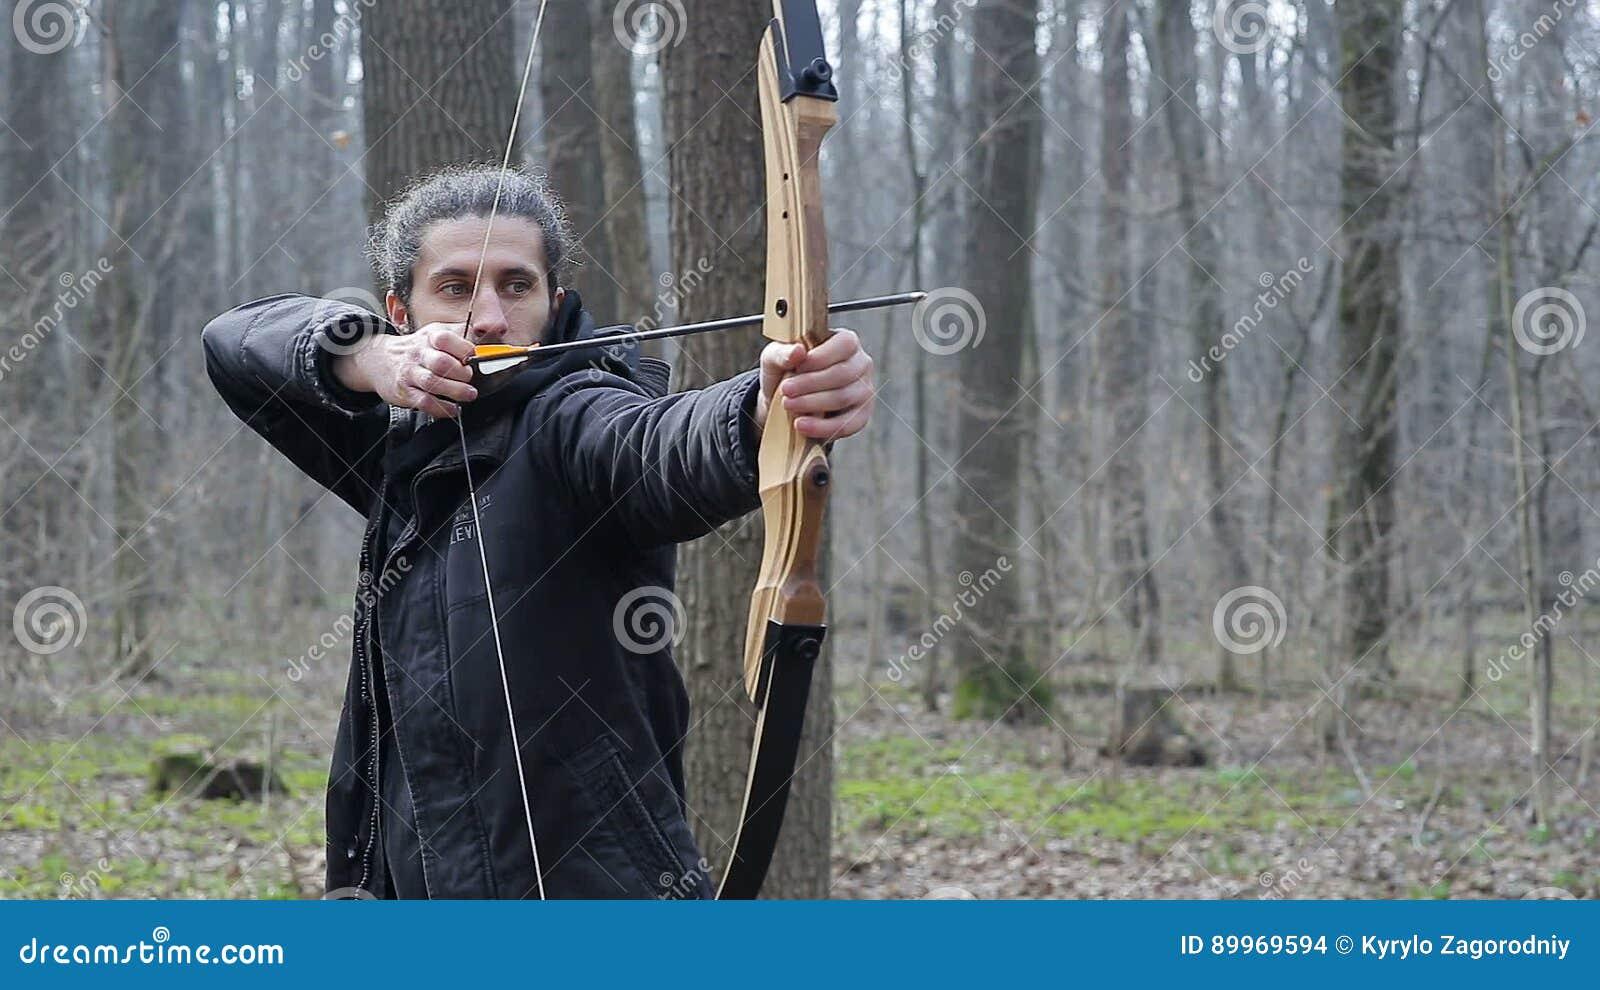 skjuta pilbåge i skogen